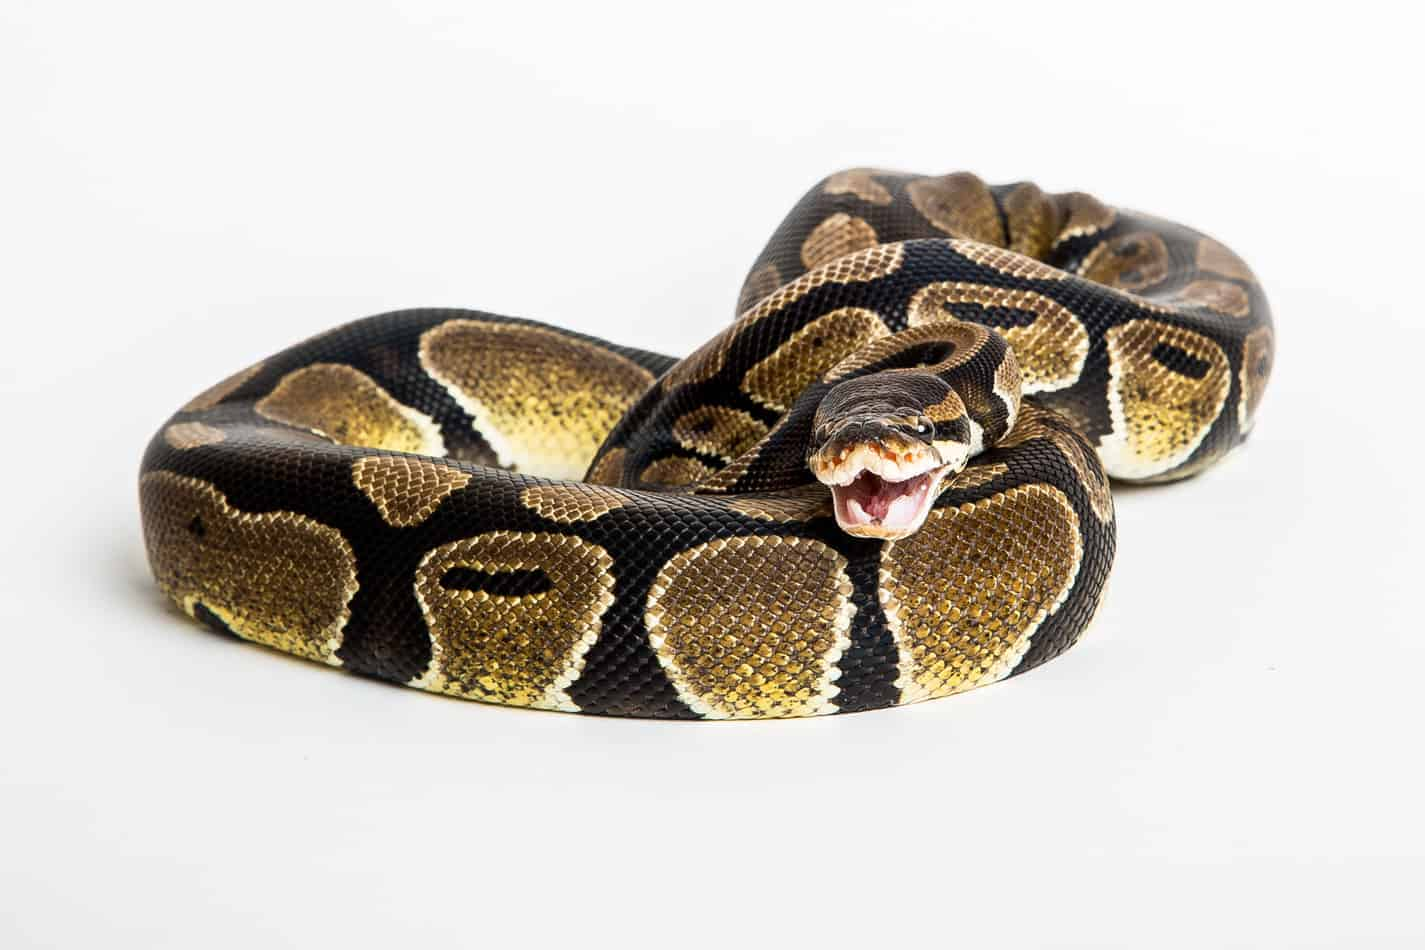 Can Ball Pythons Hiss?